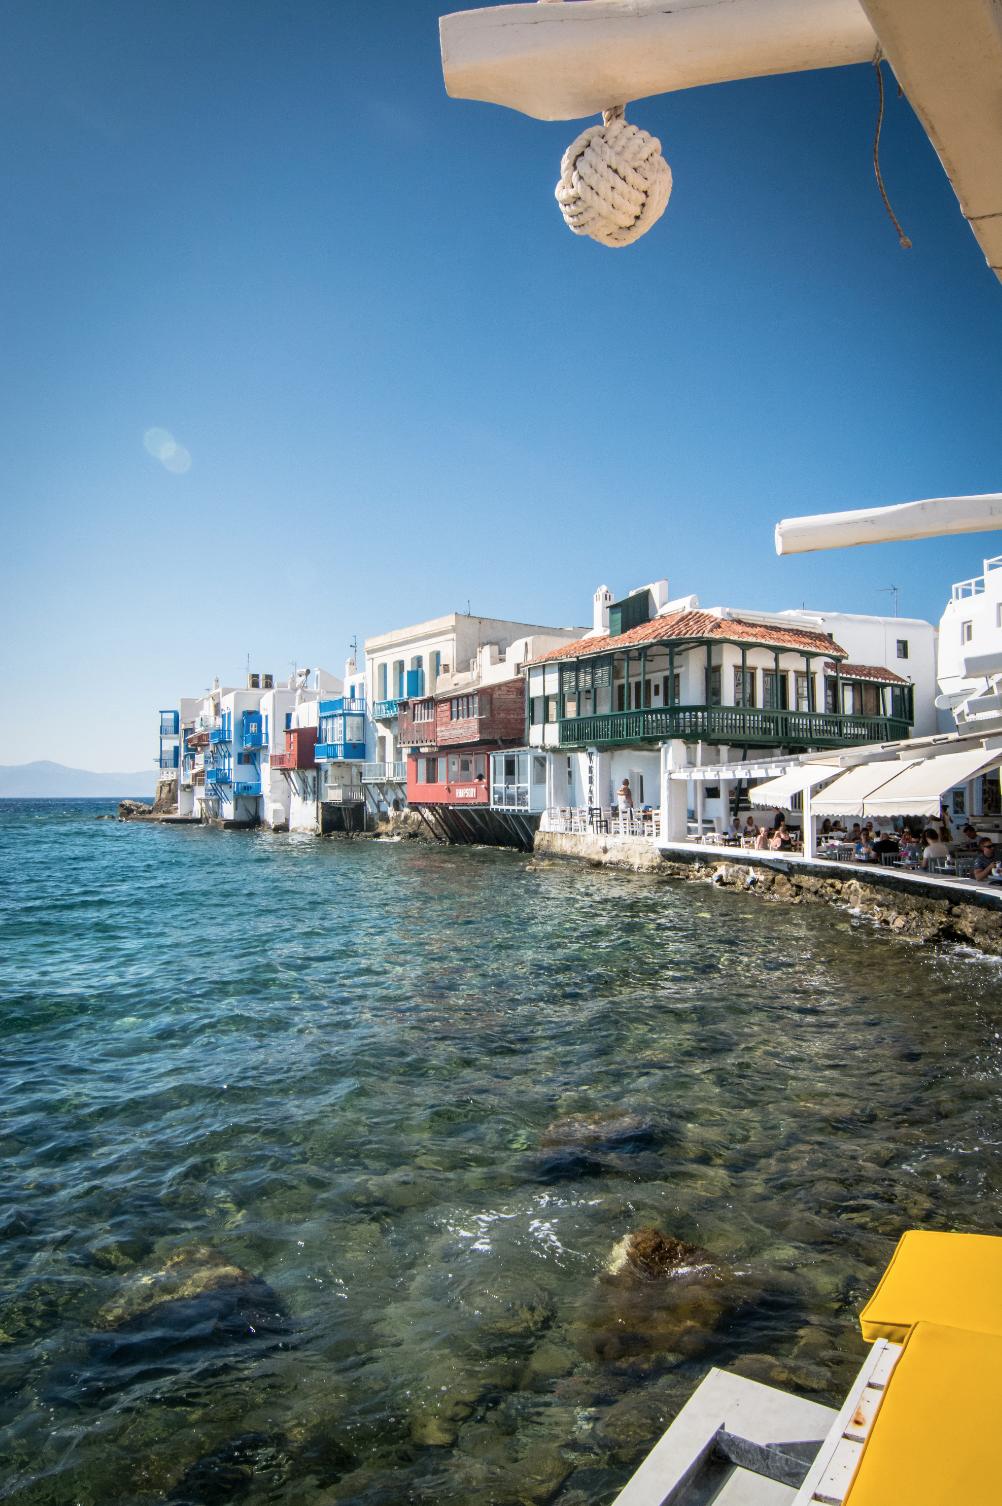 Venice Greece.png